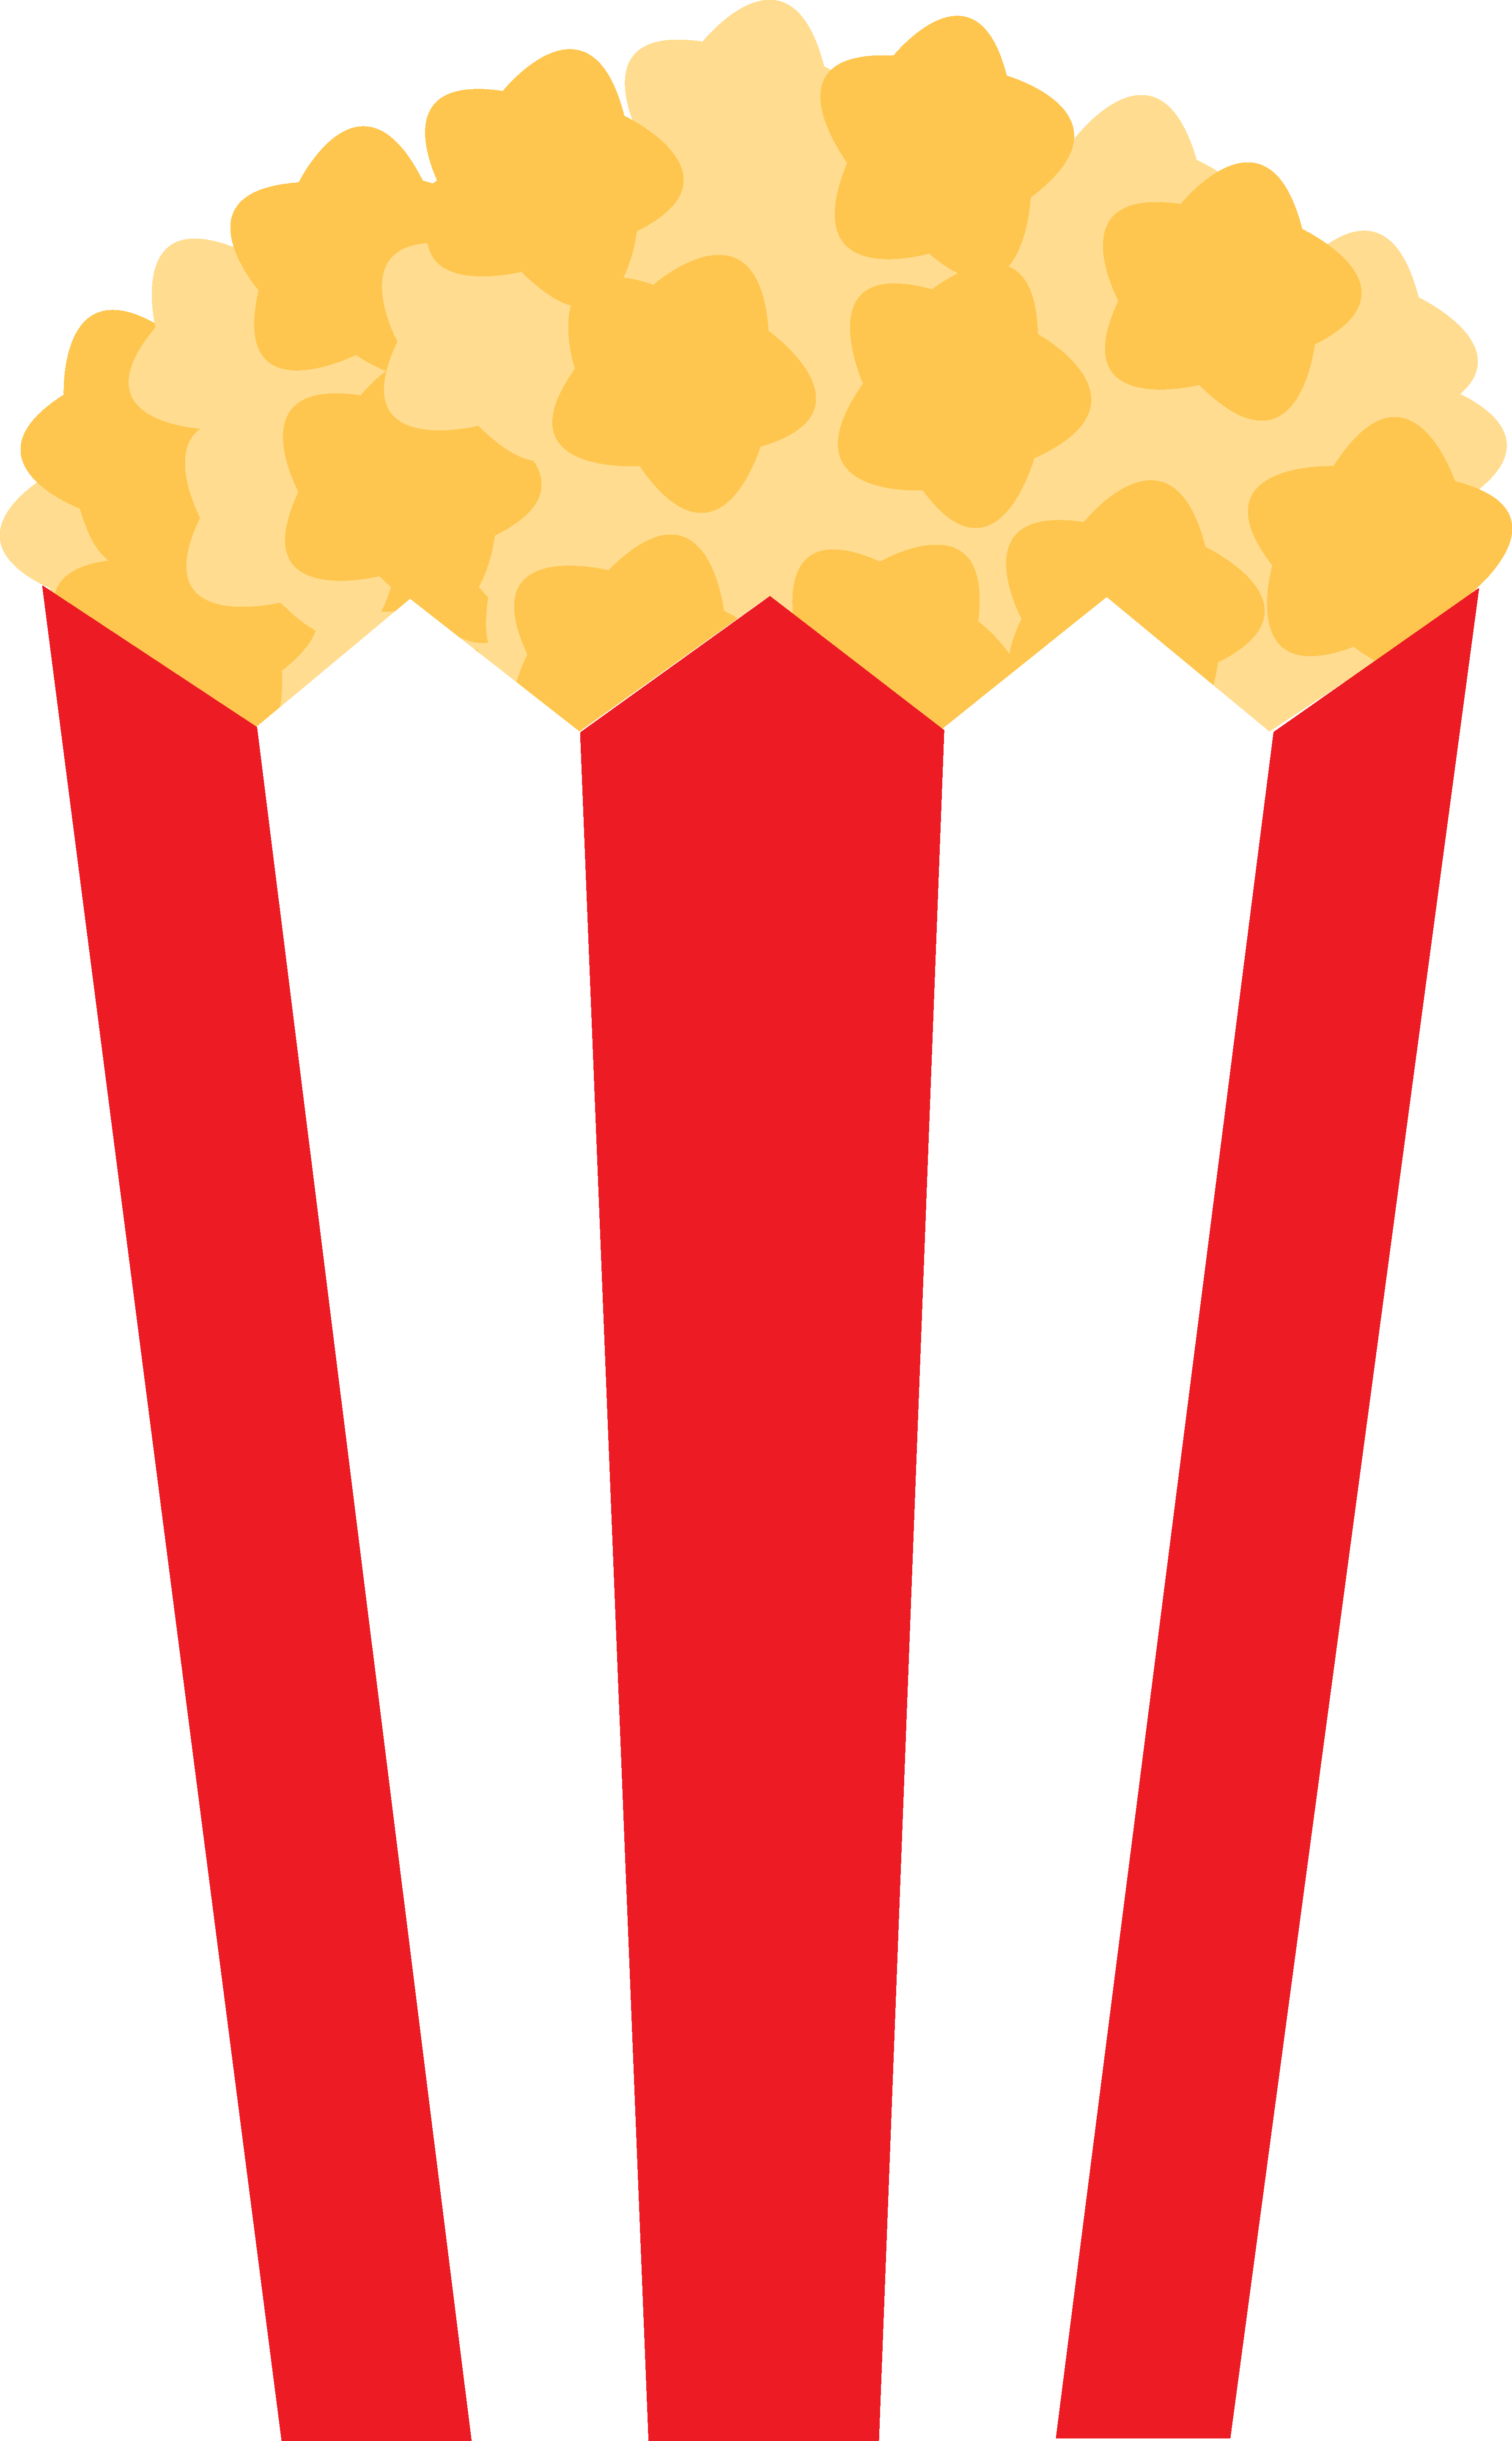 Popcorn Images Free Clip Art.